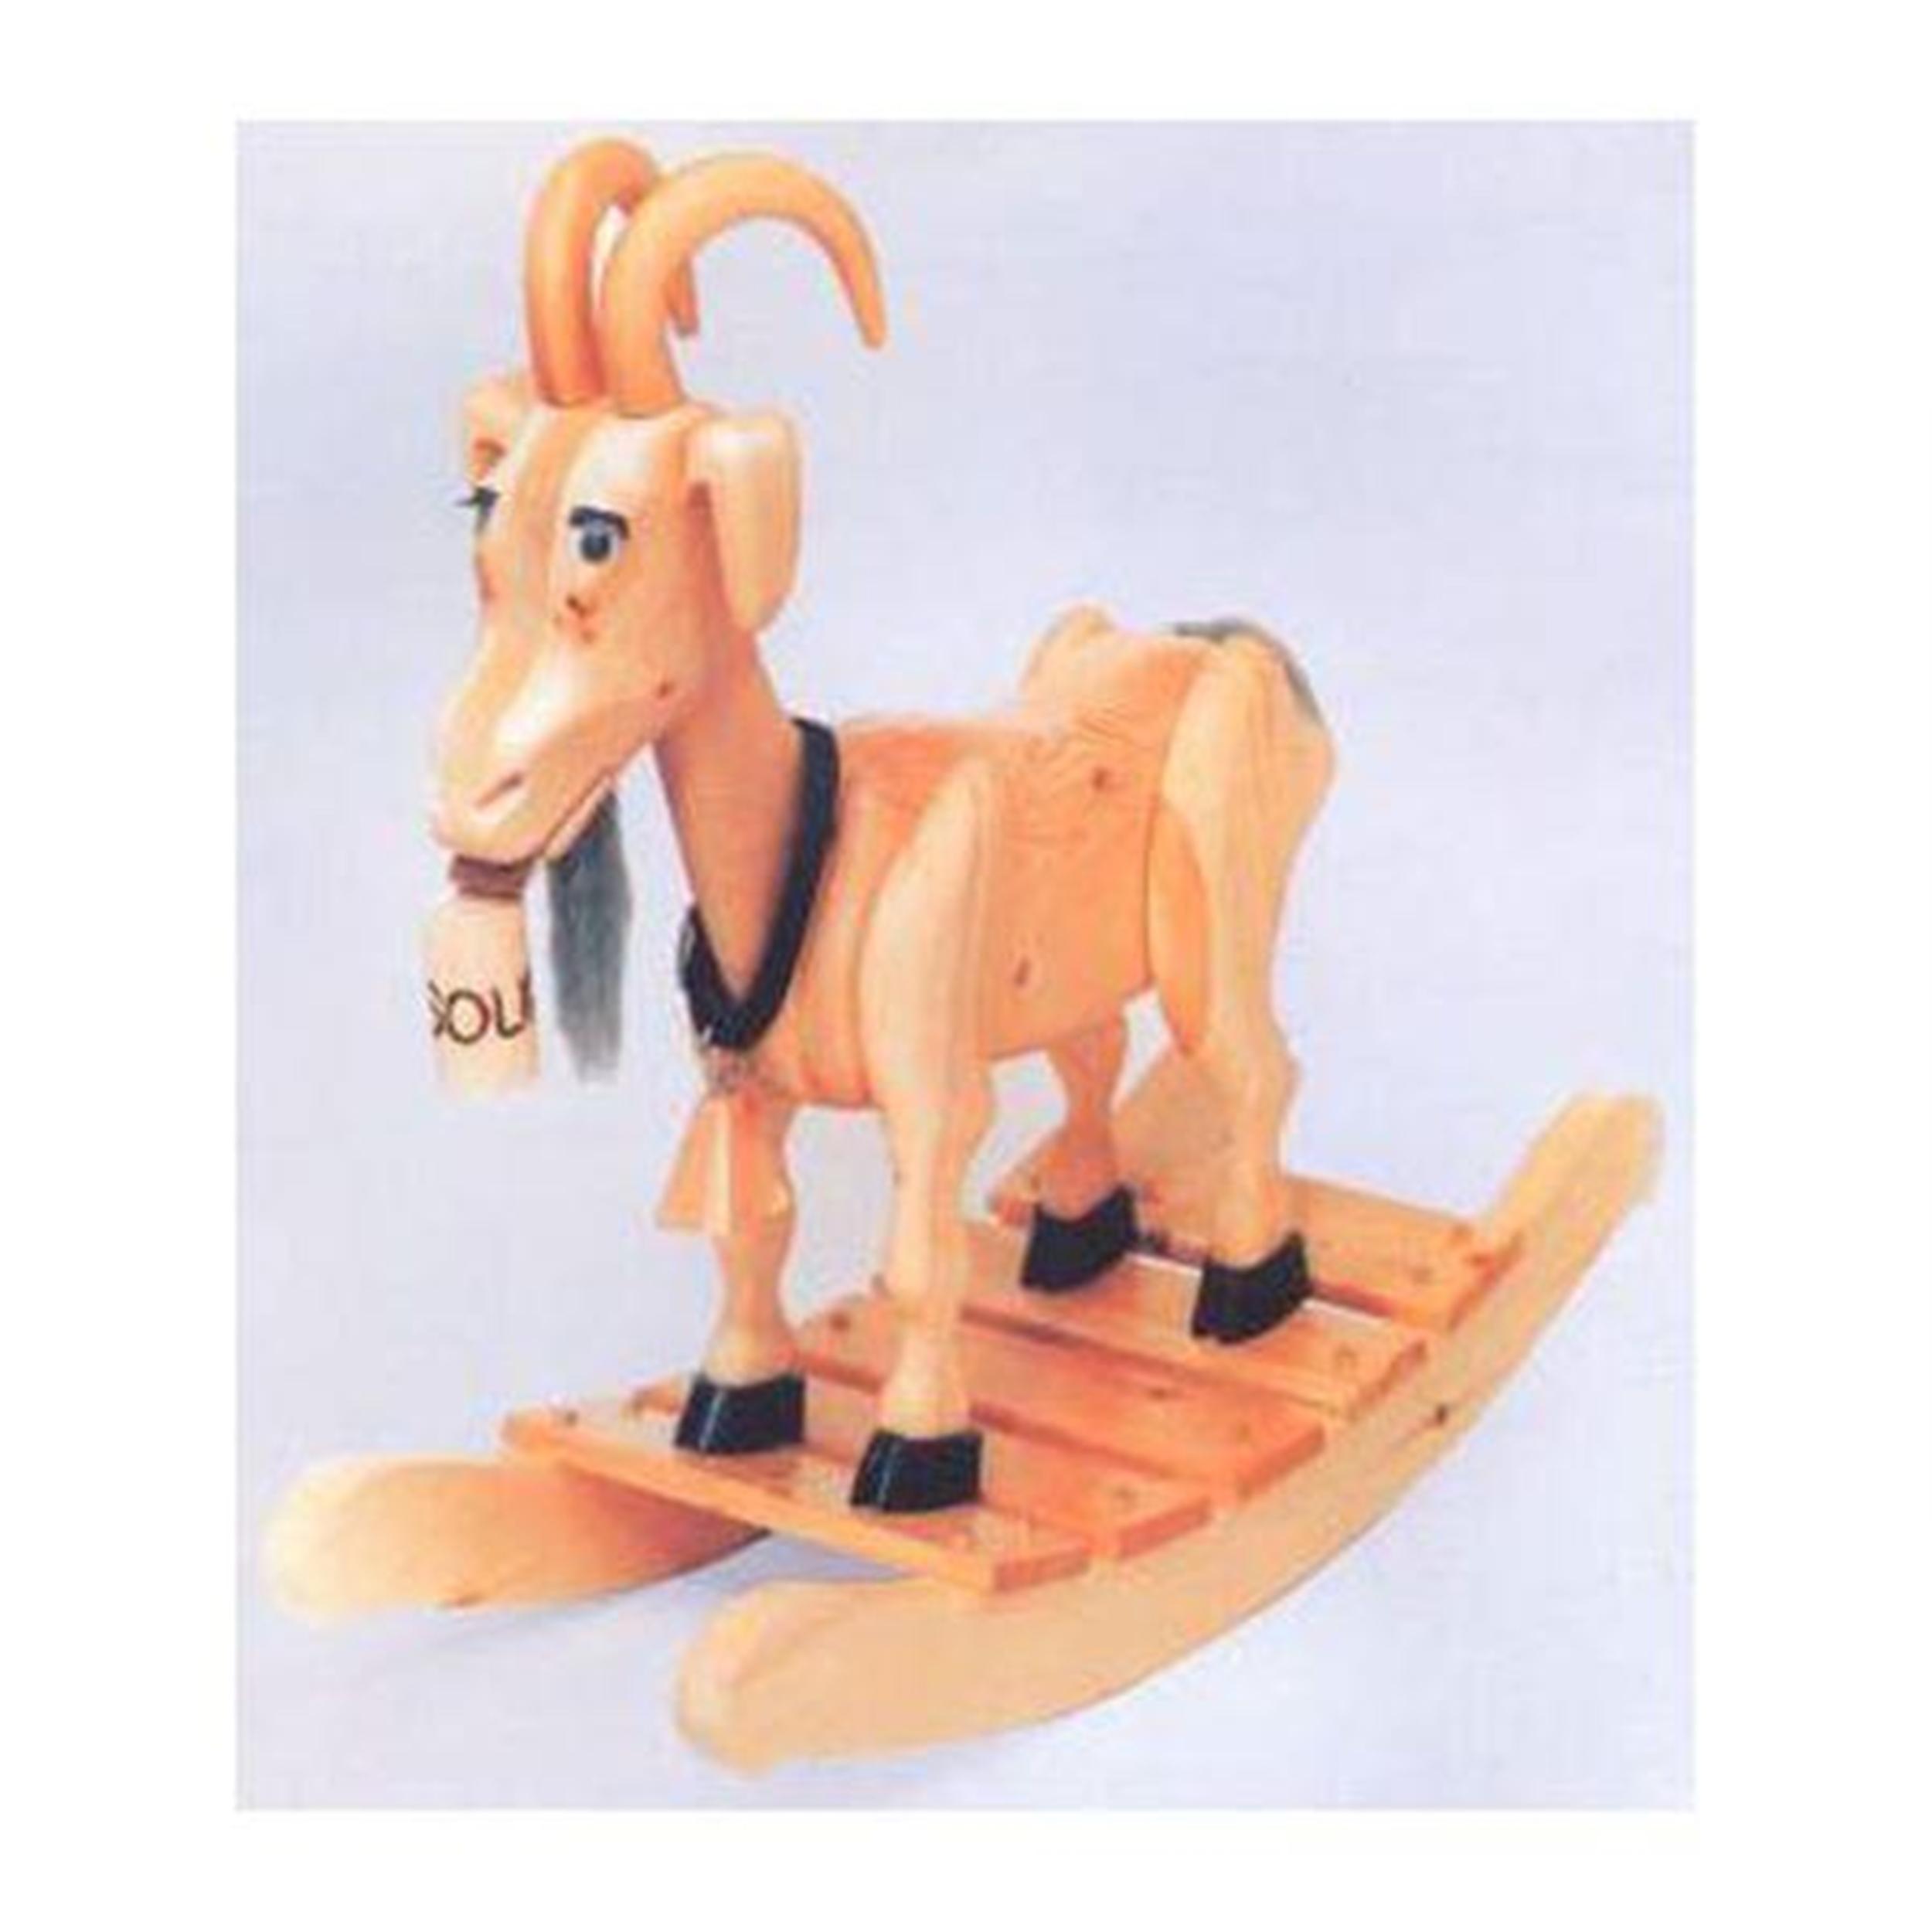 Woodworking Project Paper Plan to Build Bill E. Goat Rocker